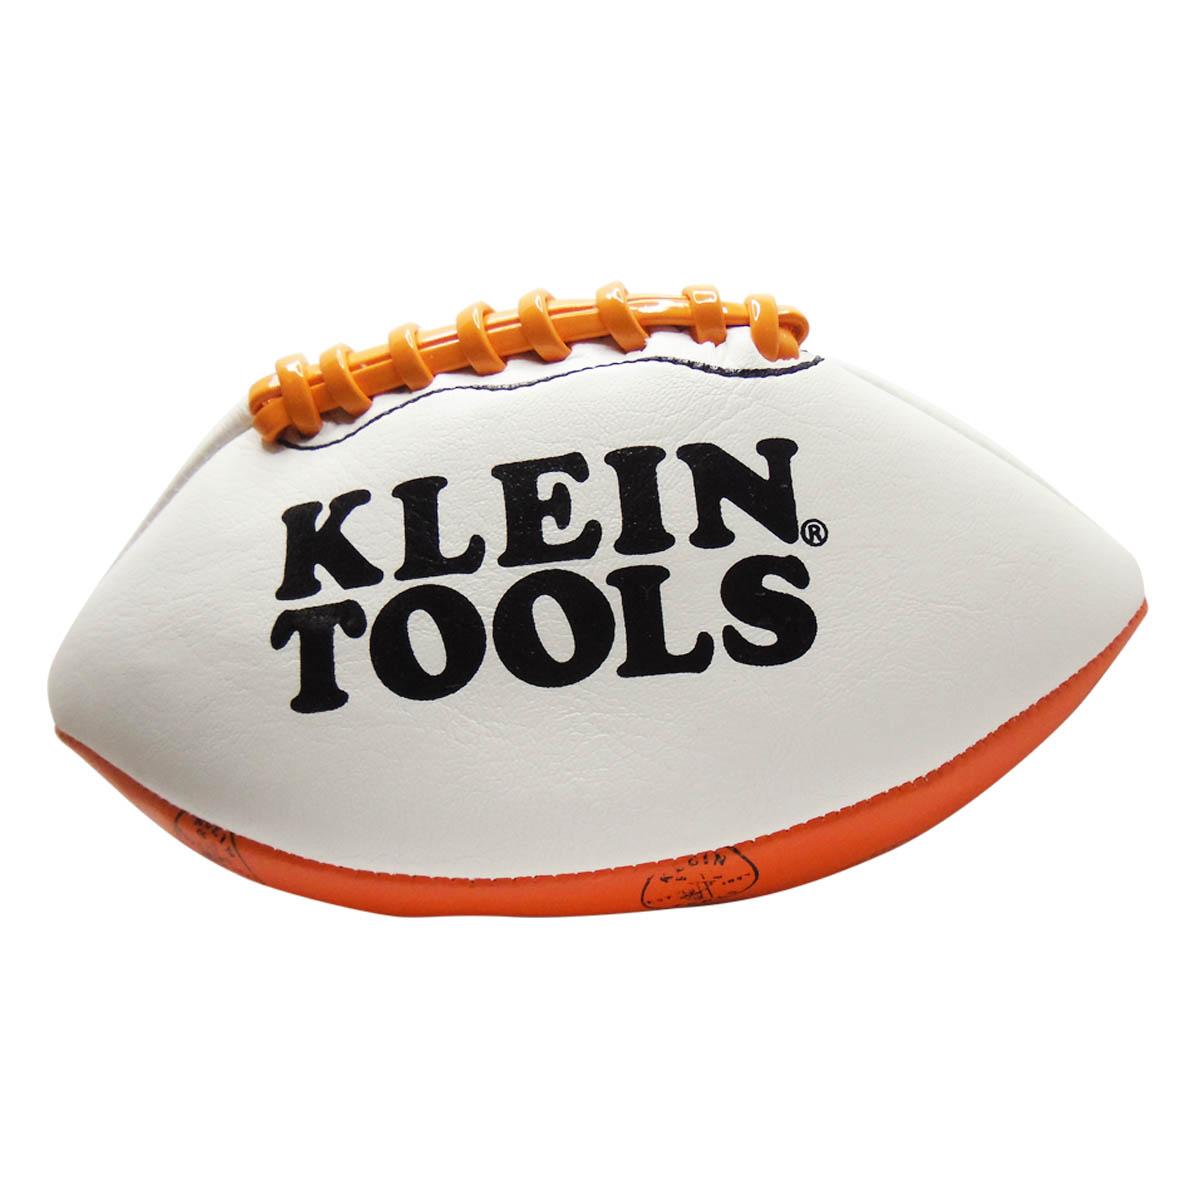 Balon Pelota Futbol Americano #3 Naranja Blanco Klein Tools